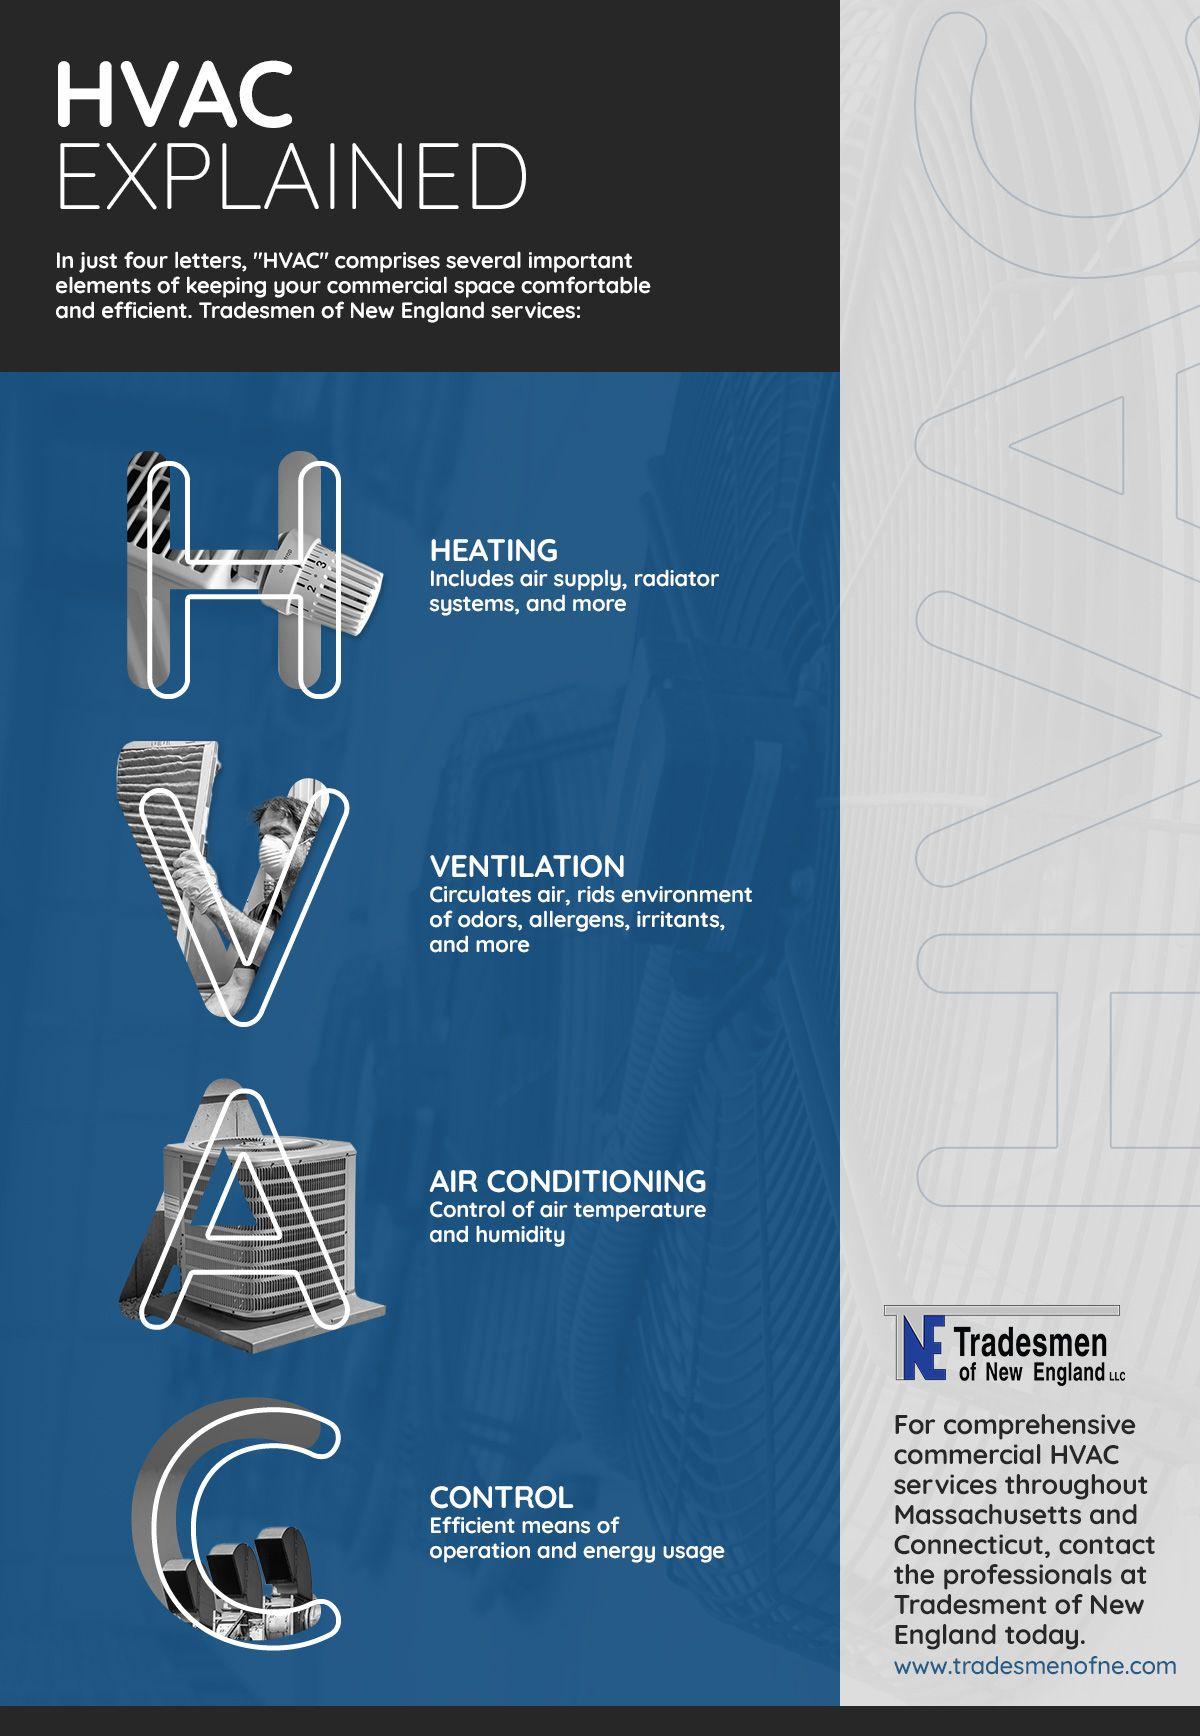 2.2.21_HVACExplained_Infographic.jpg